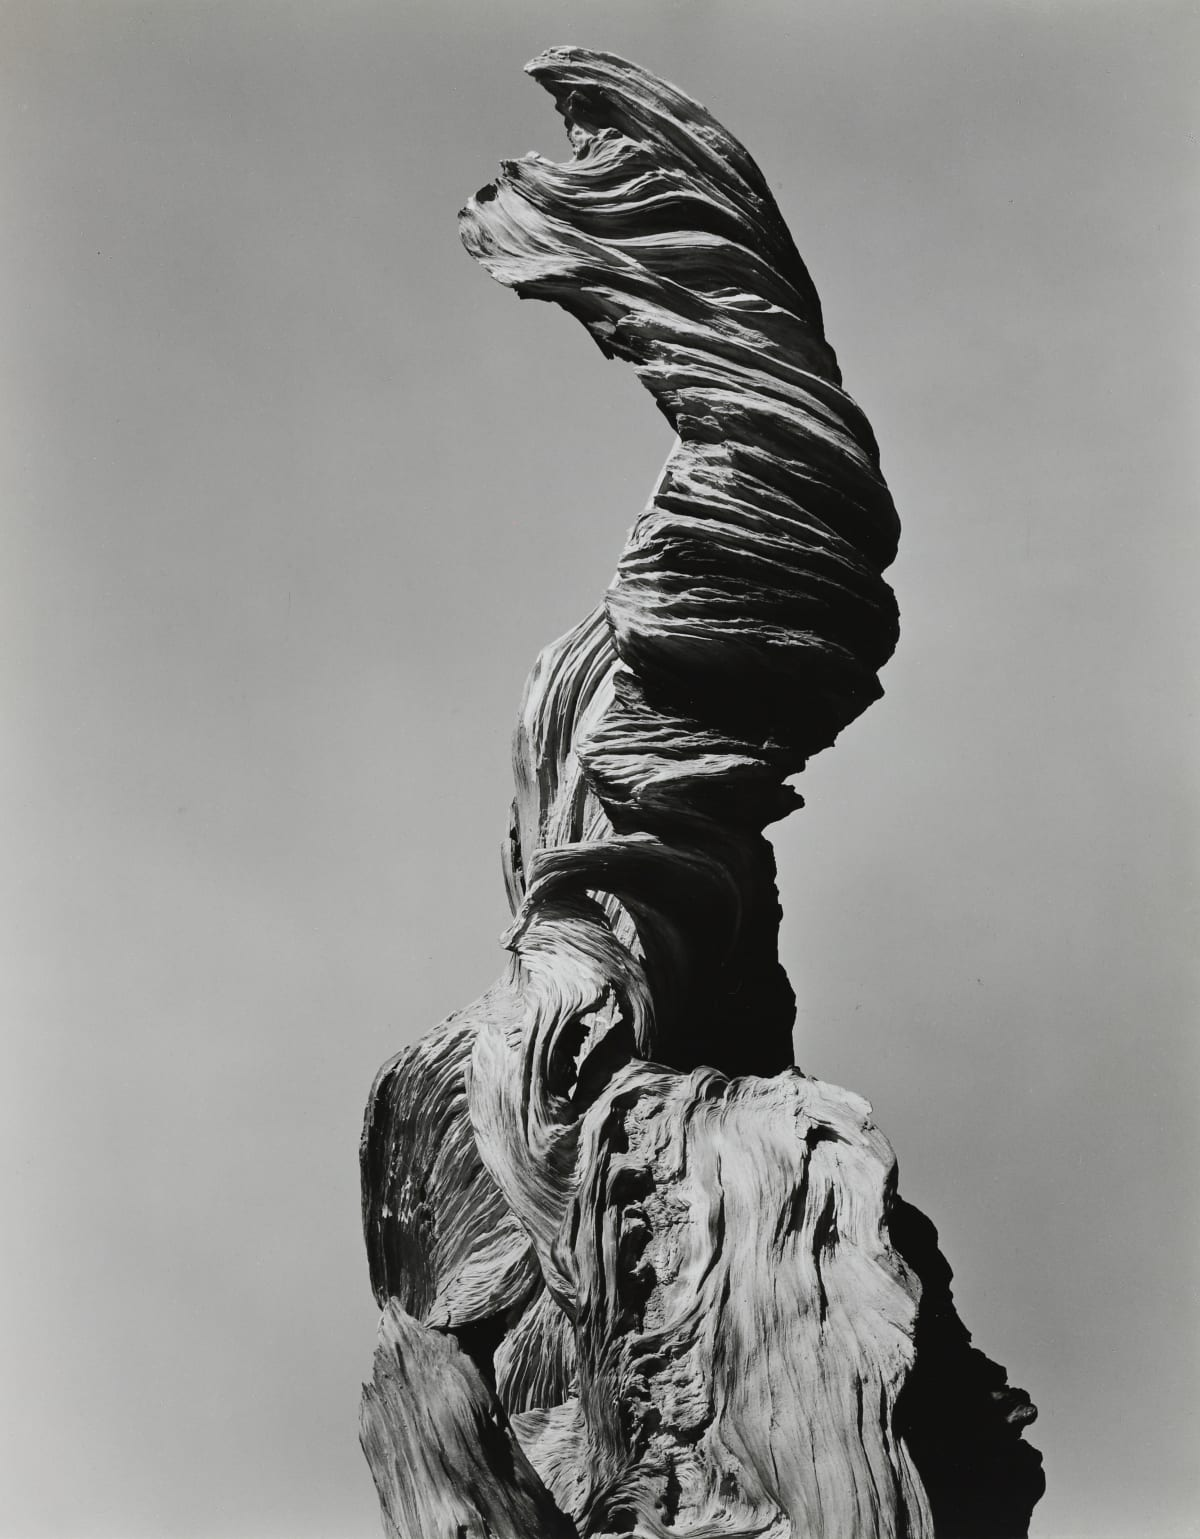 Edward Weston, Stump Against Sky, 1936